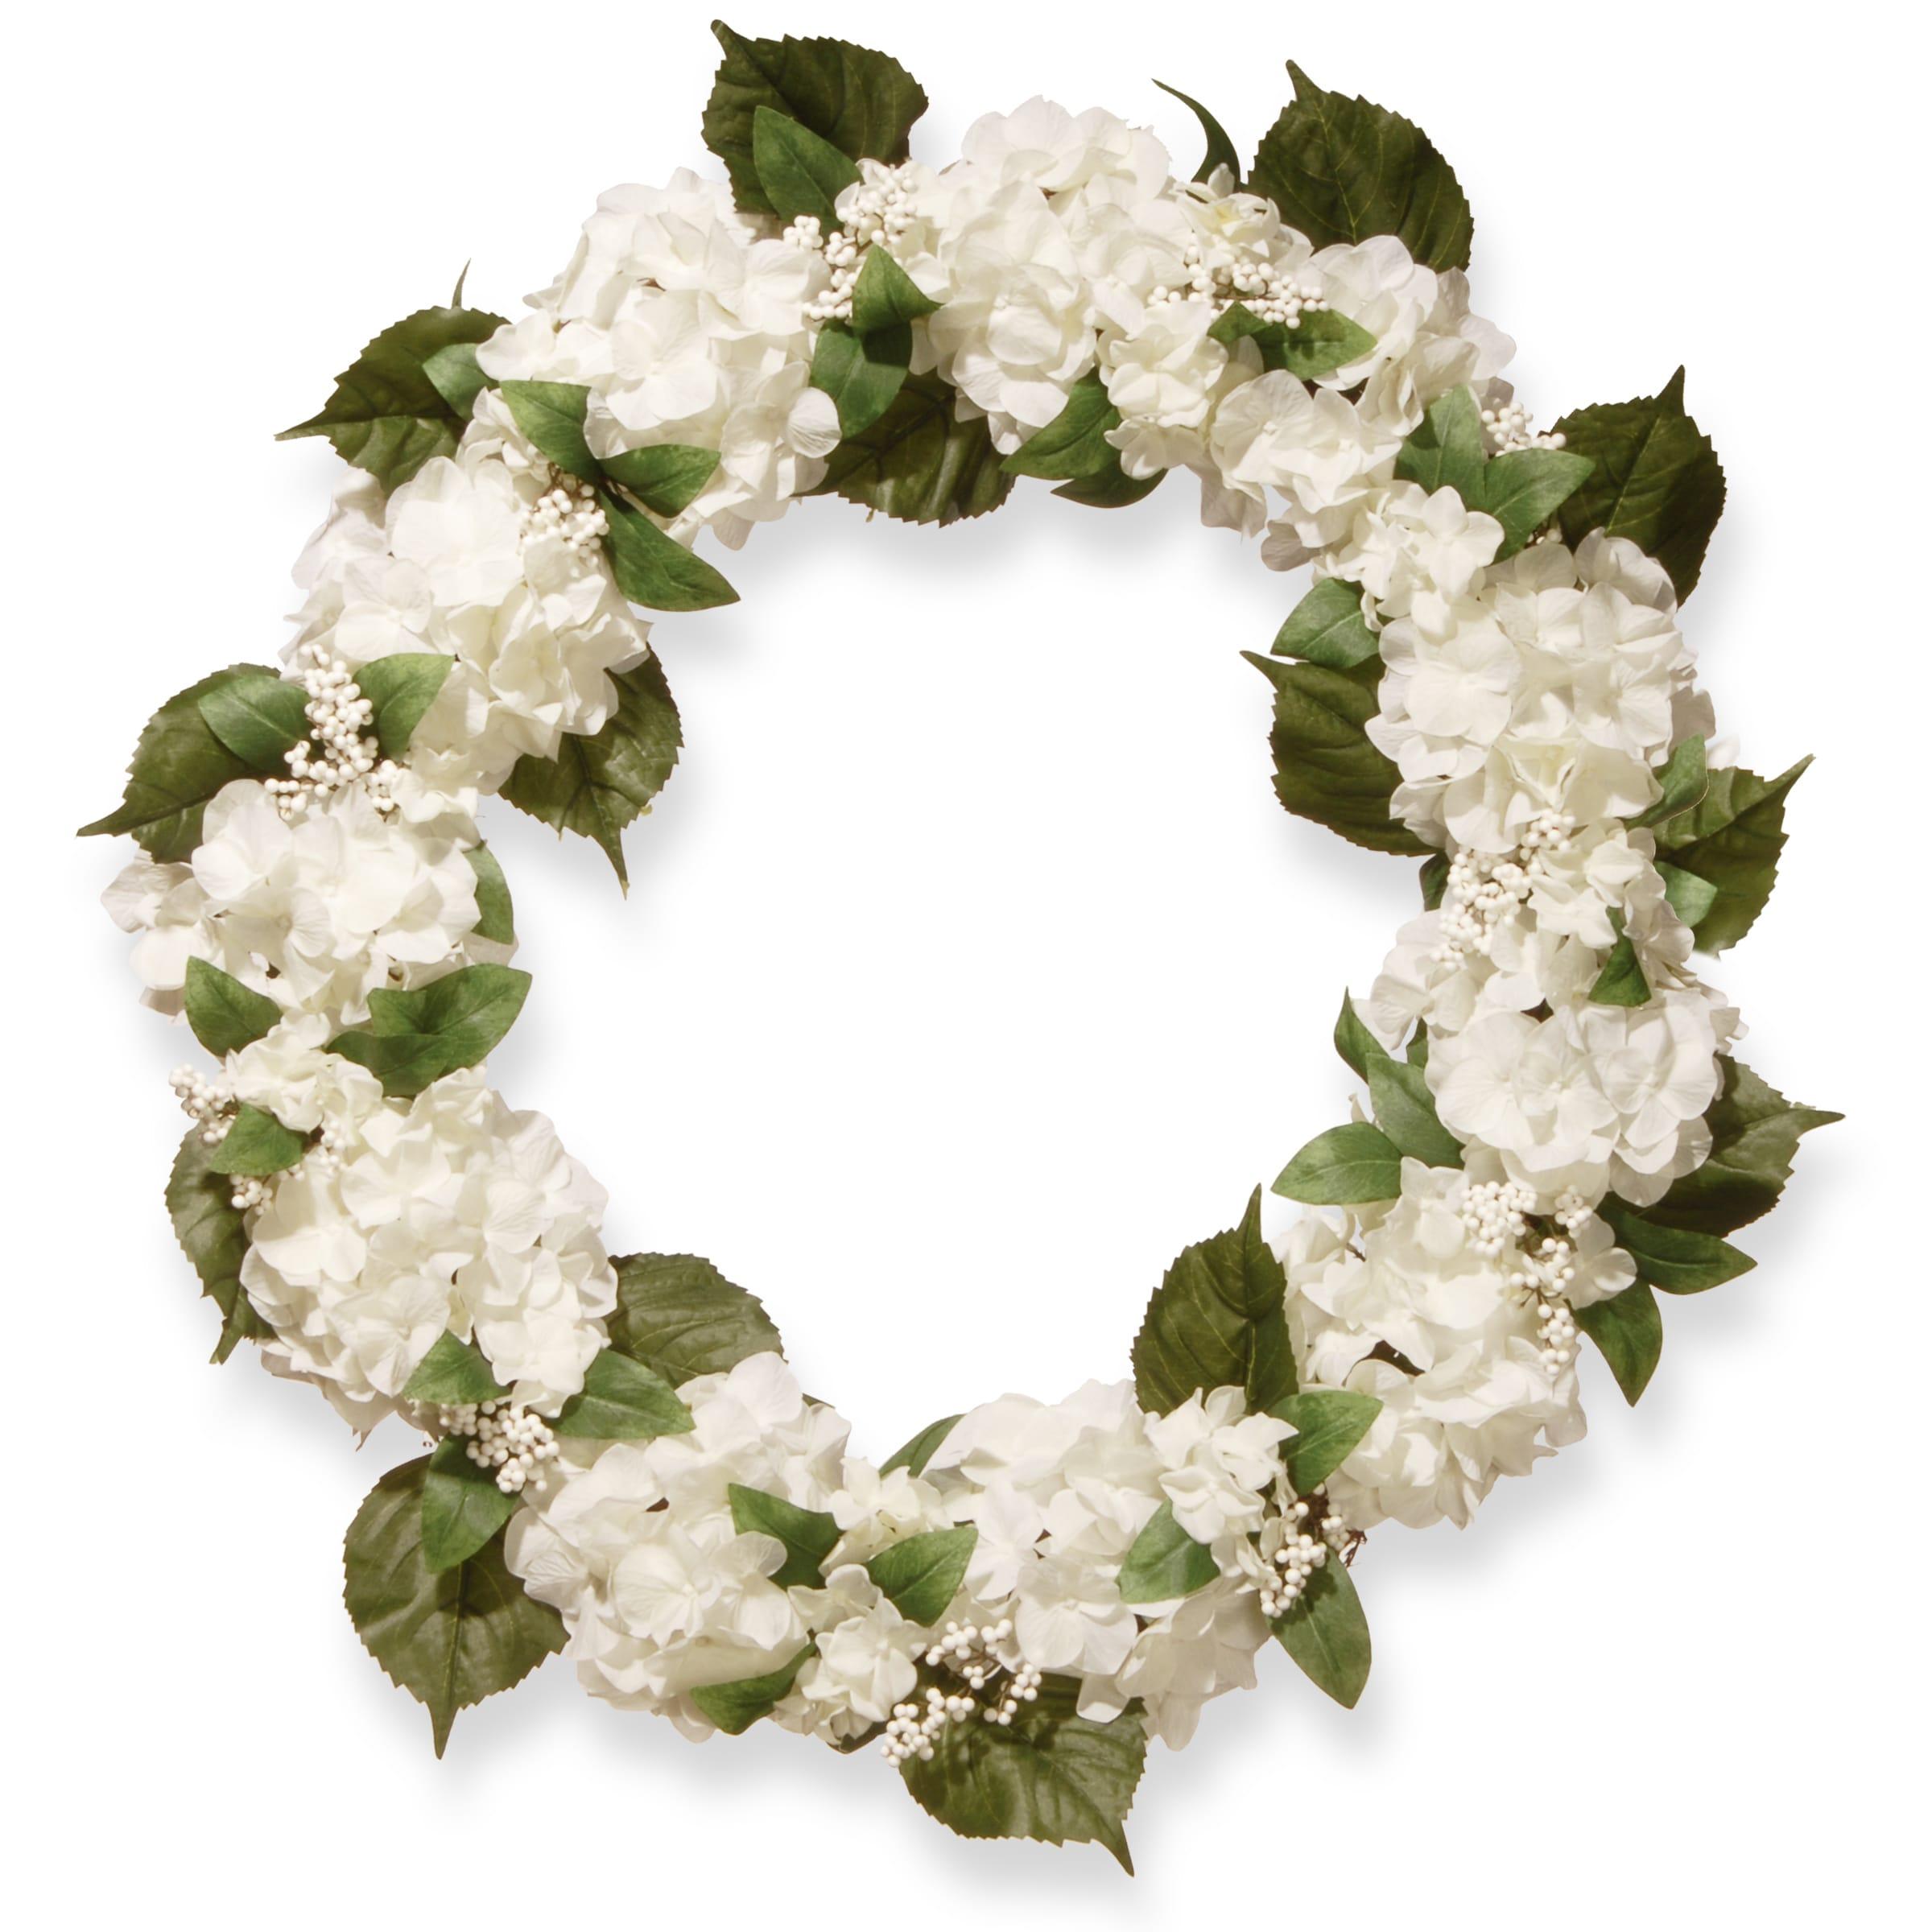 National Tree Company 32-inch Cream Hydrangea Wreath (CREAM)